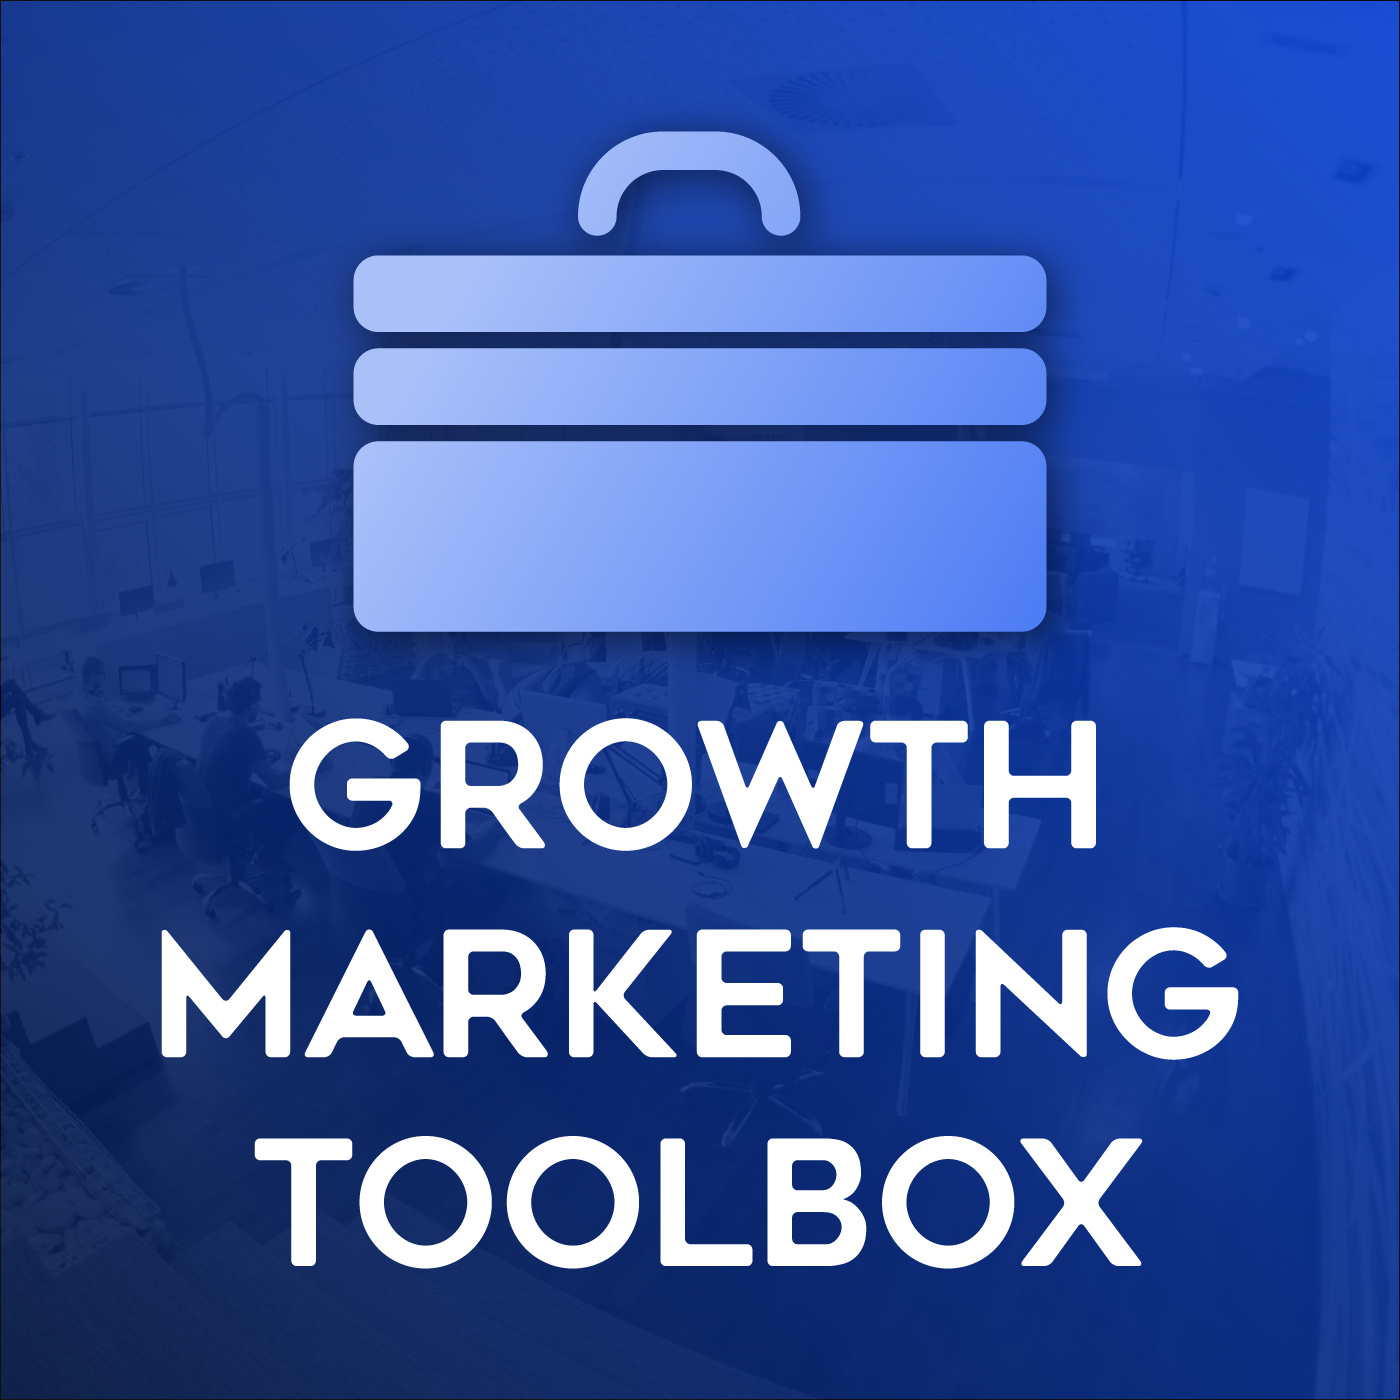 Growth Marketing Toolbox Podcast Logo Nicholas Scalice Earnworthy